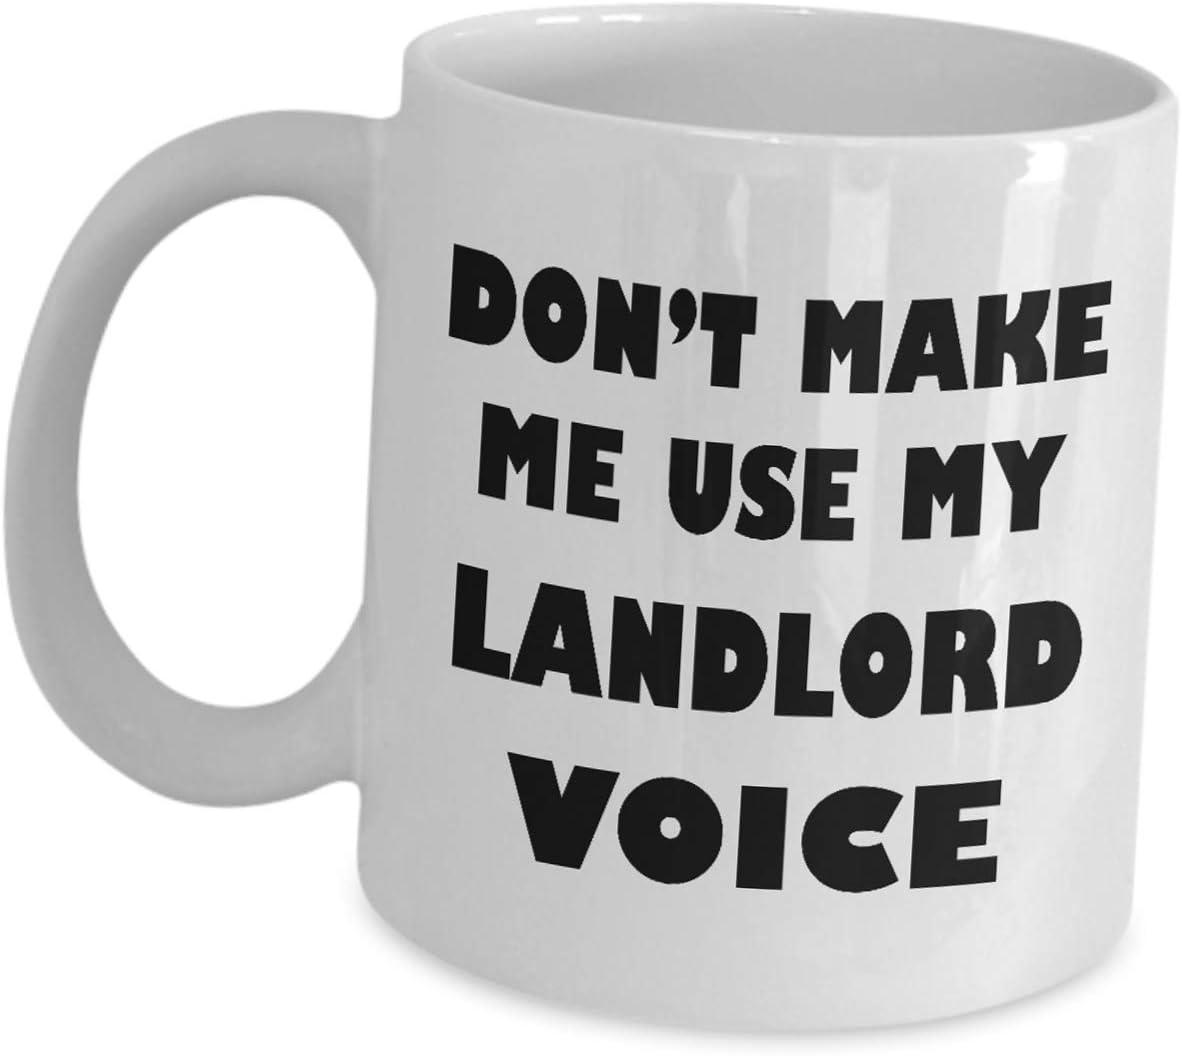 Don/'t make me use my Landlord Voice 10oz funny Mug 041